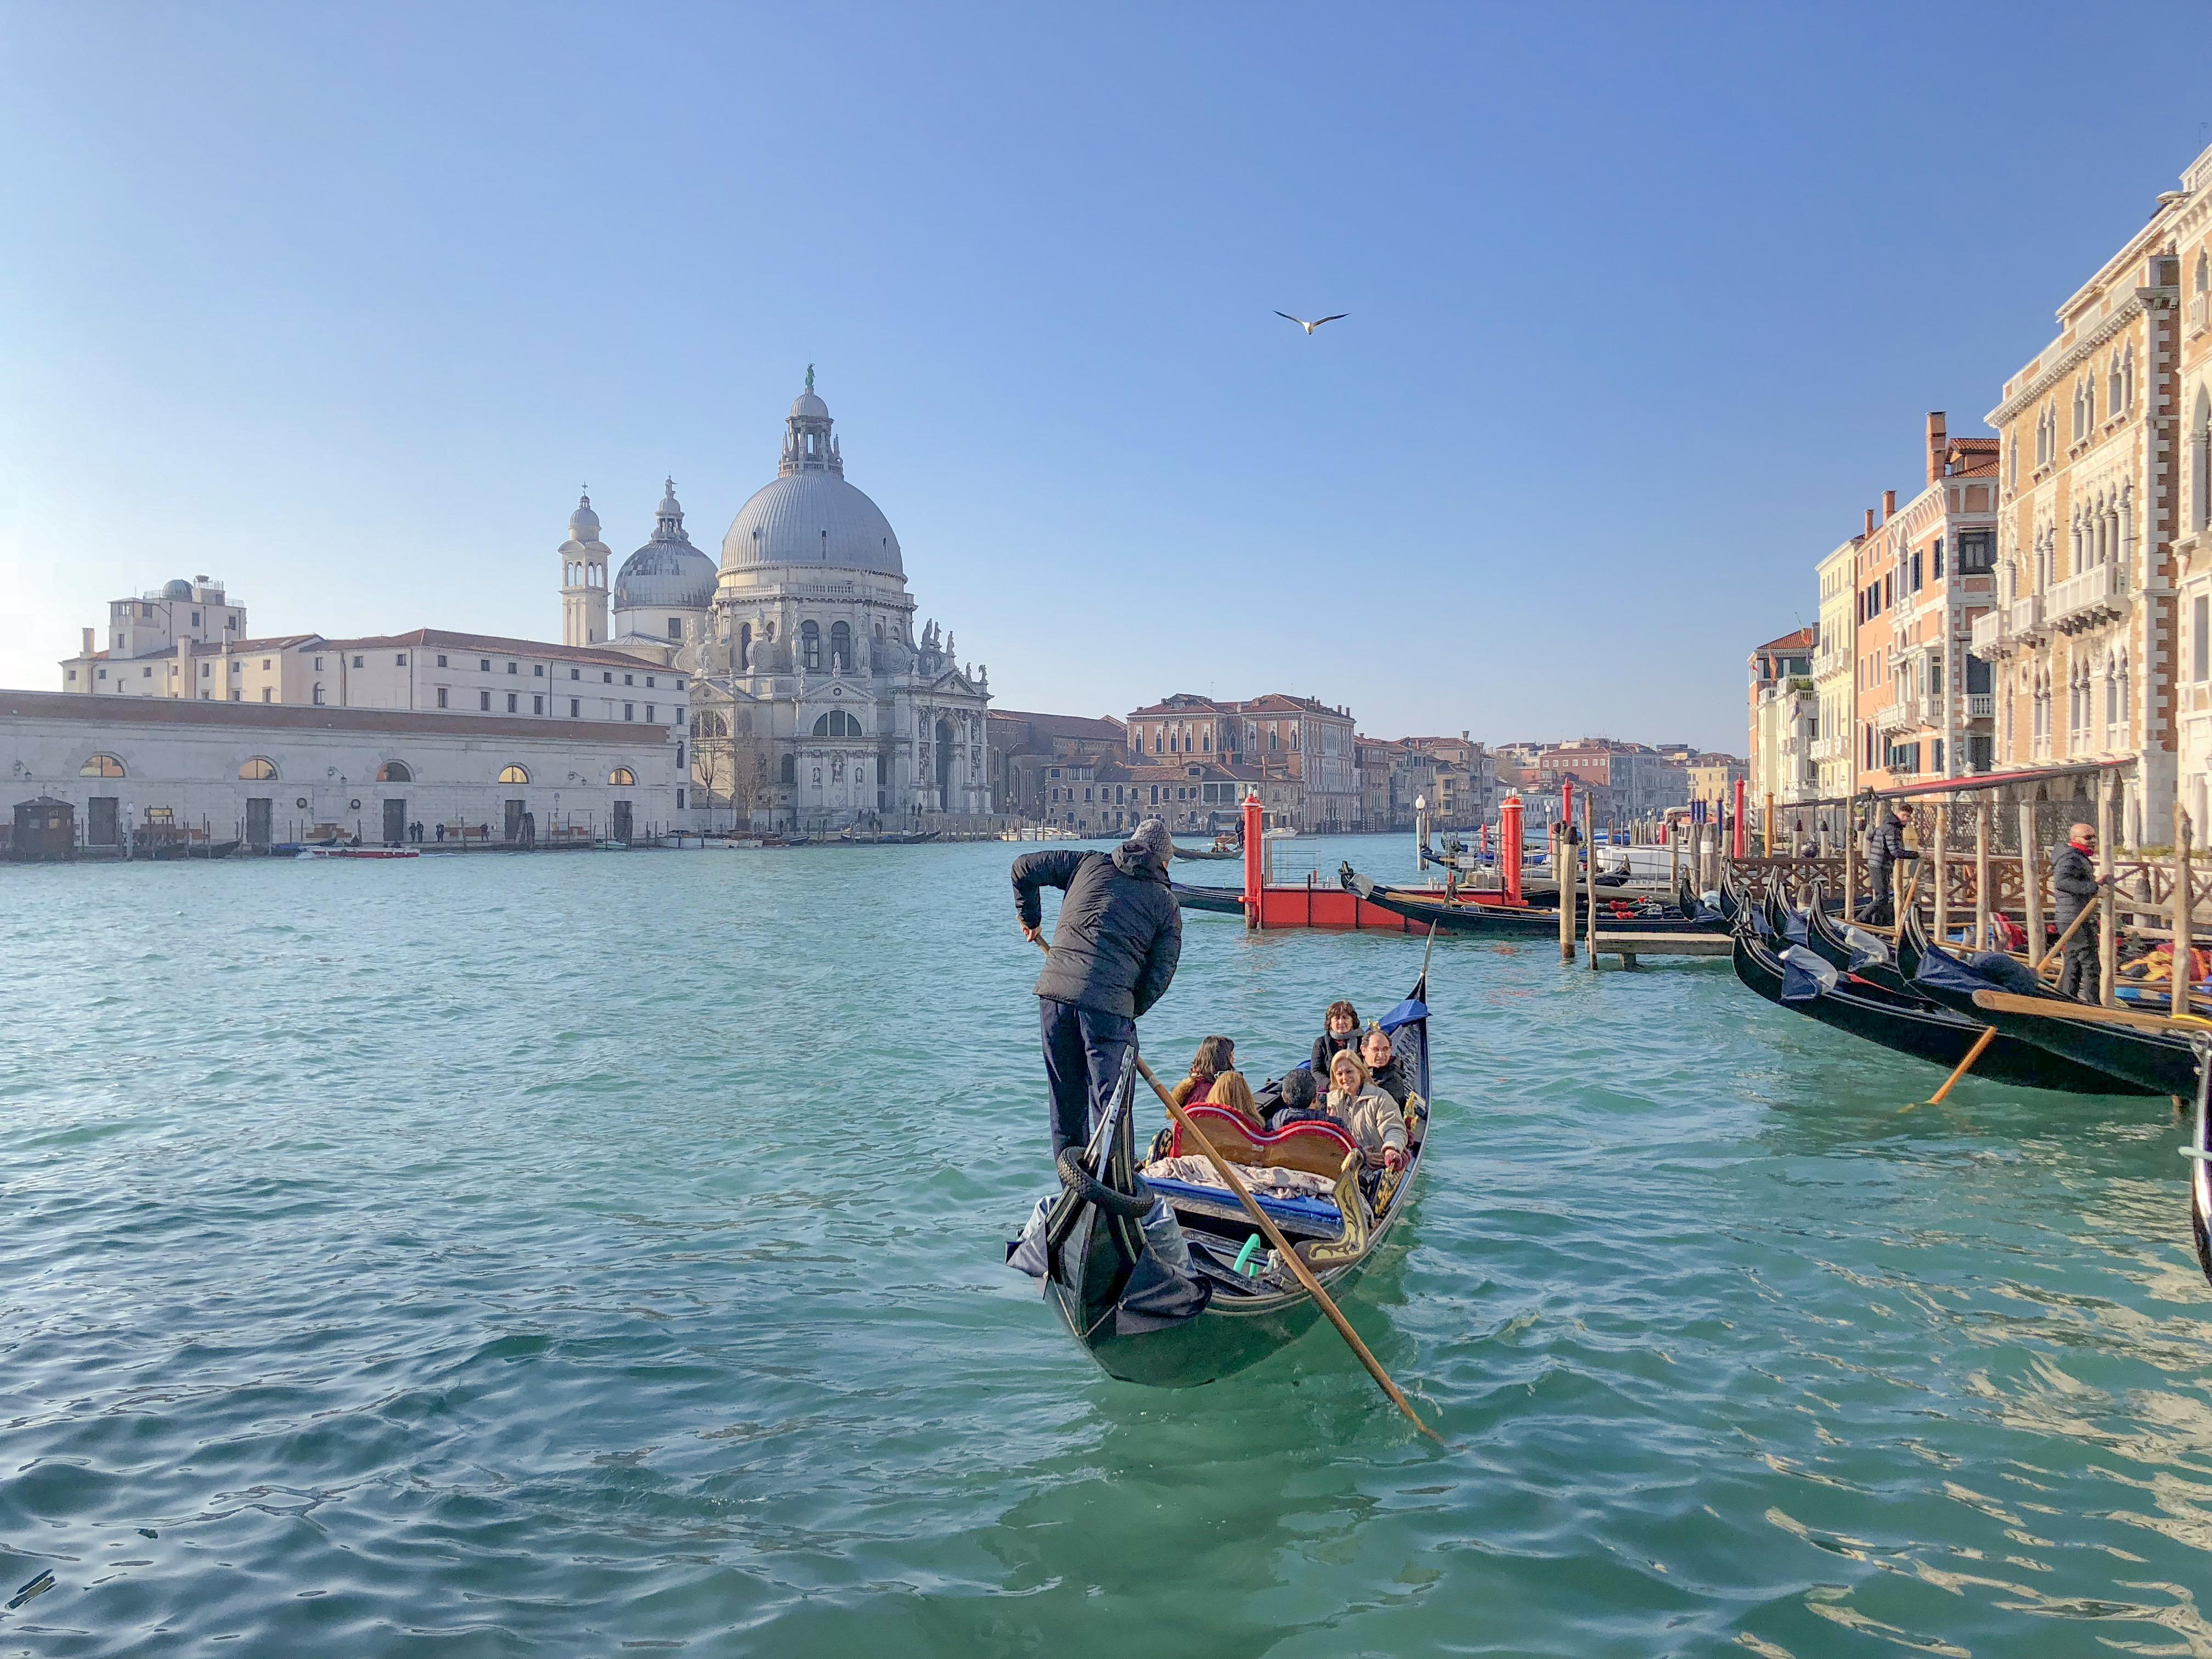 passeio de gondola em Venezia